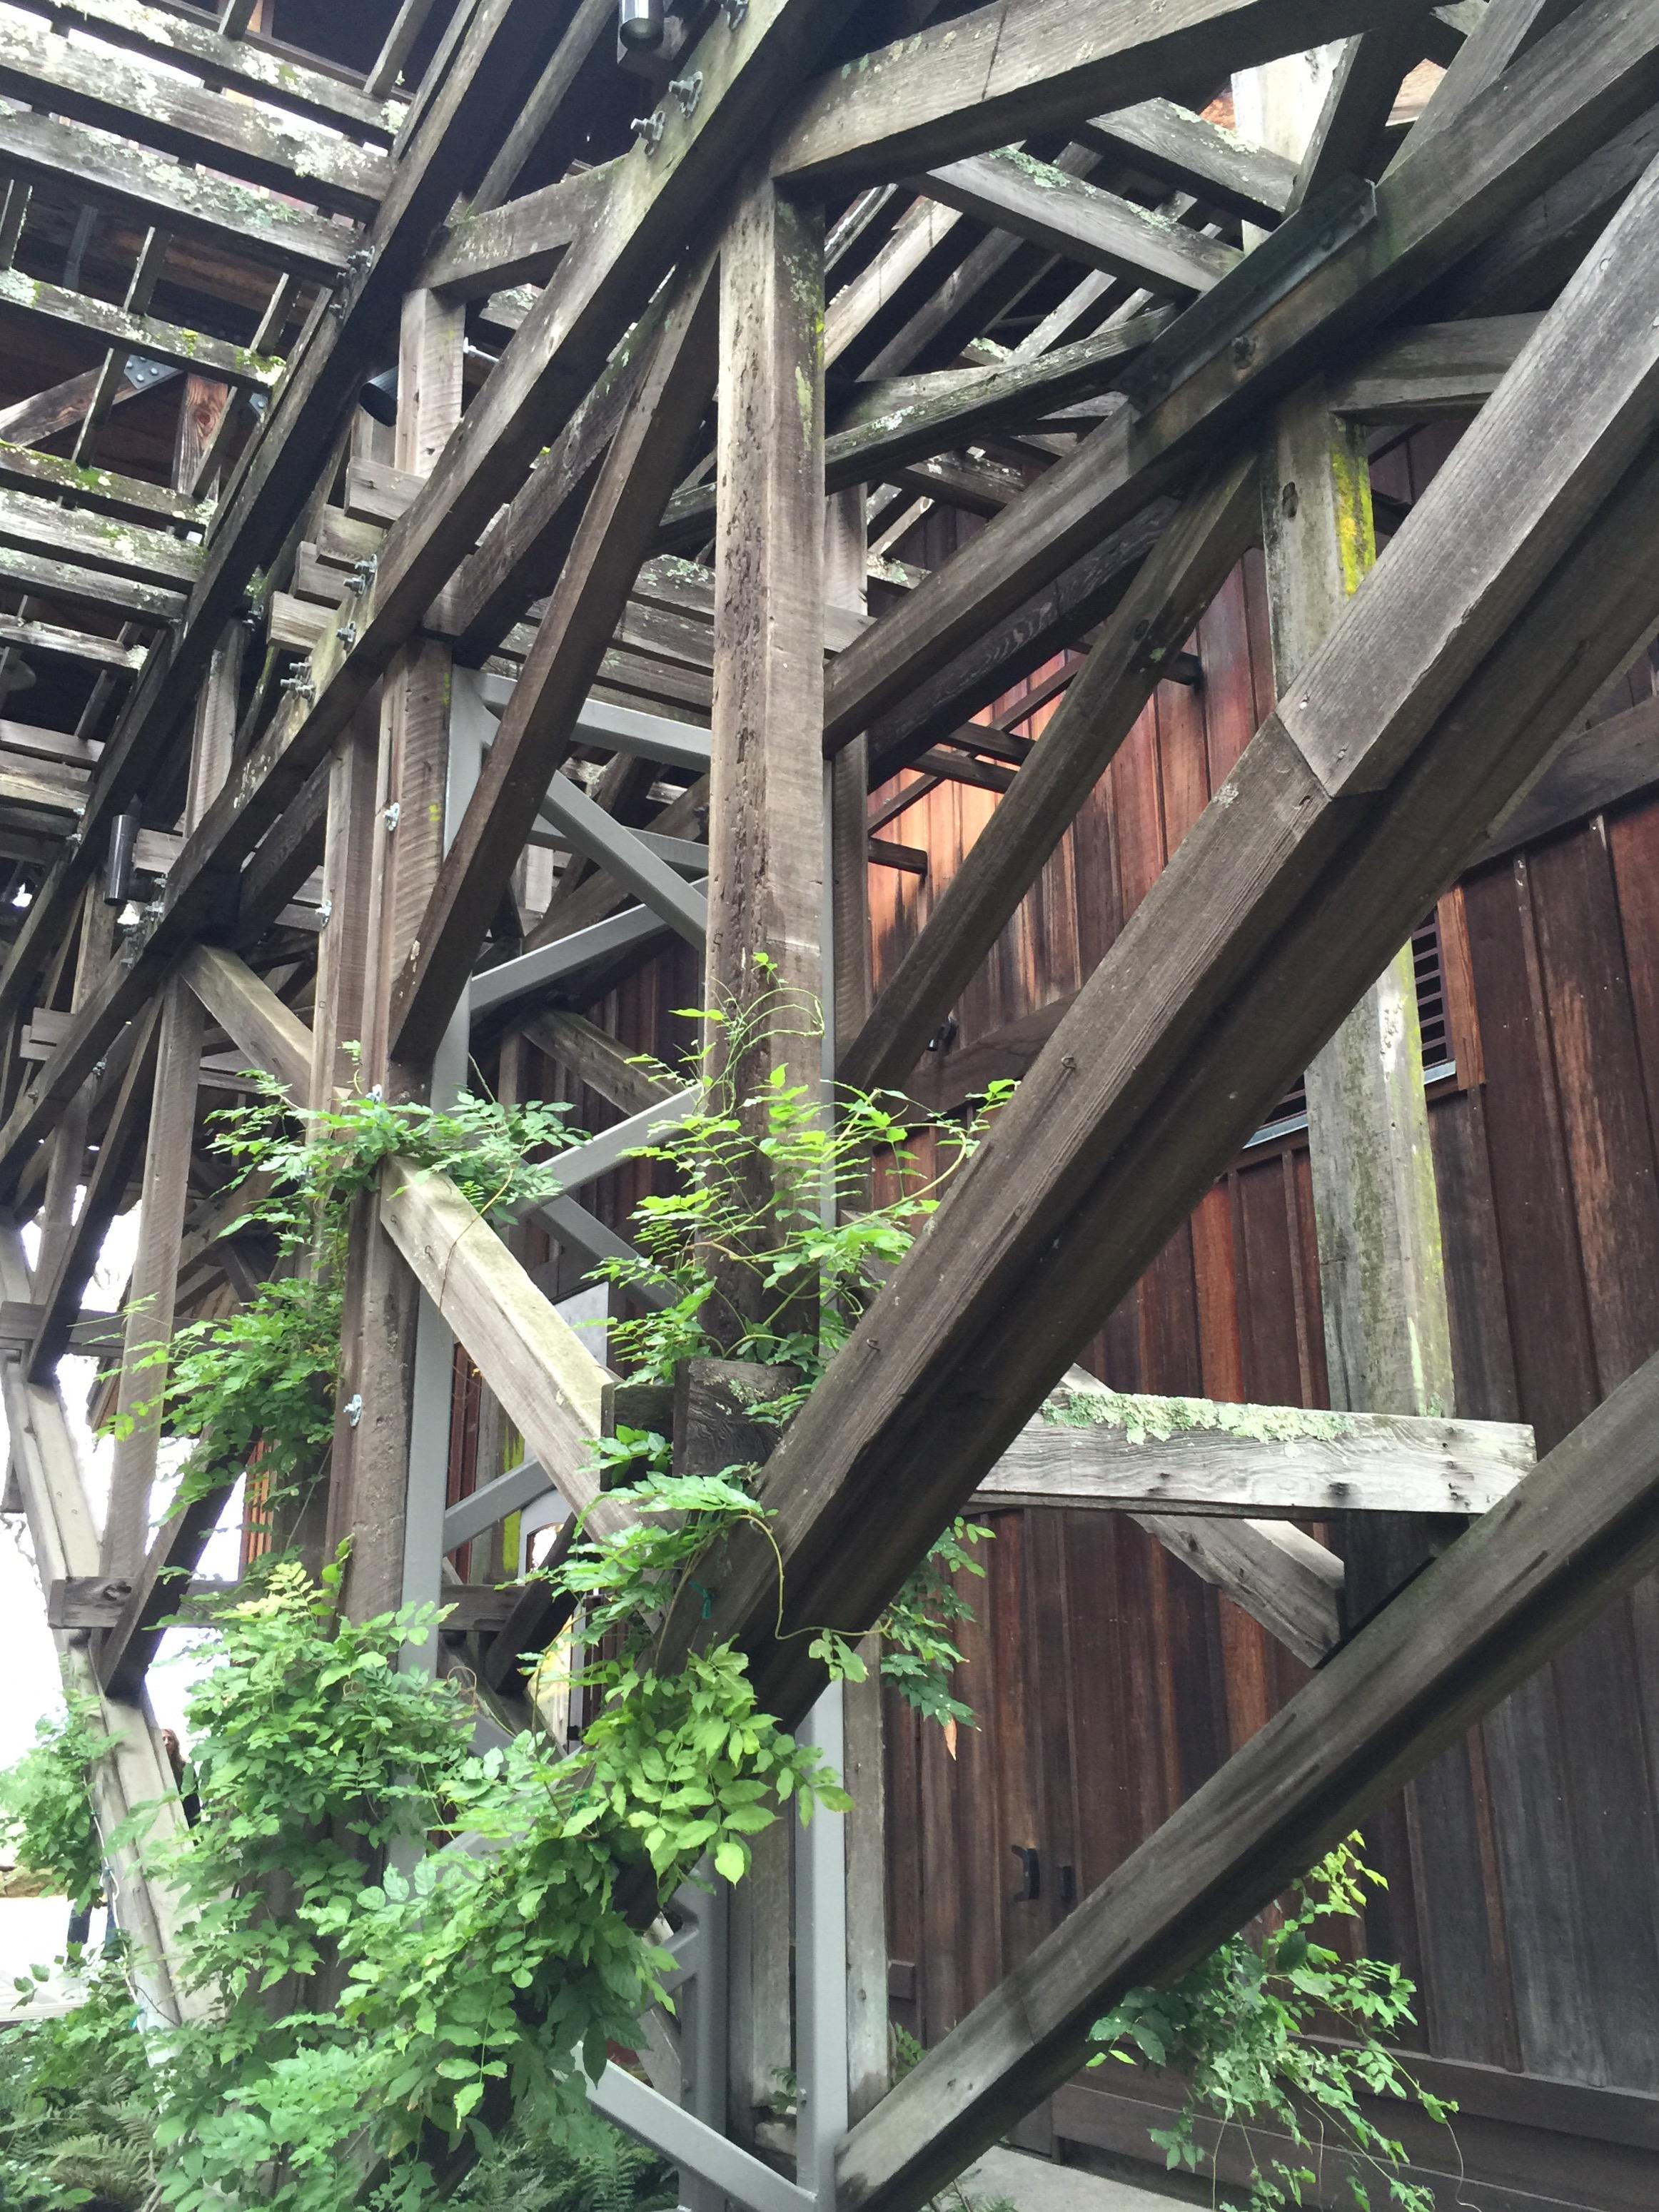 Trellis detail at Joseph Phelps Vineyards Winery in Napa Valley